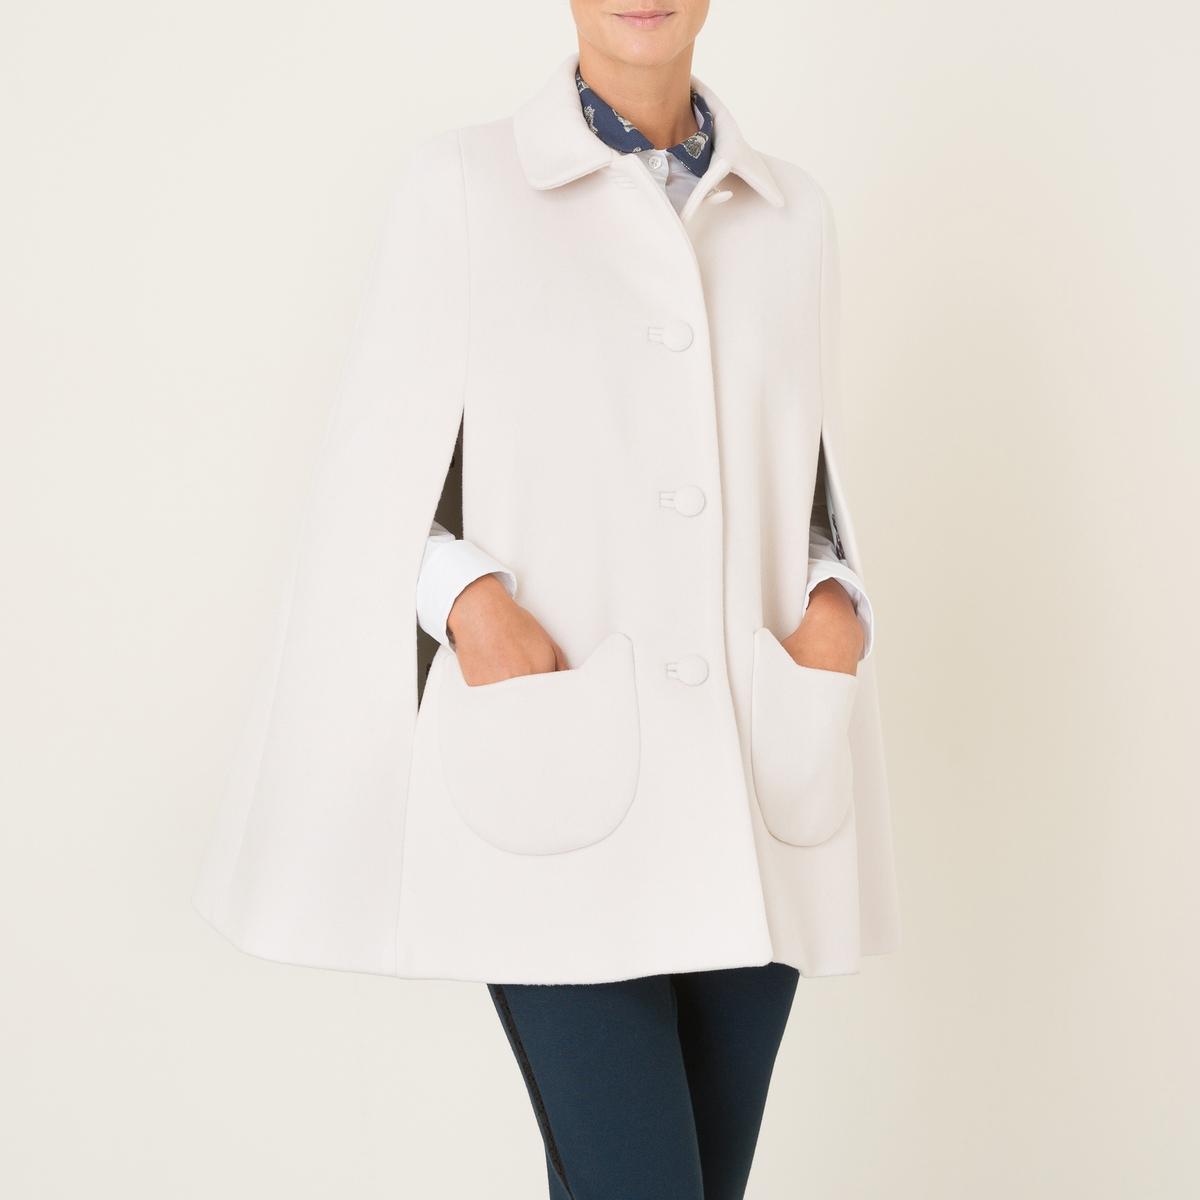 Пальто в стиле кейп ANATOLE helen williams paul and virginia